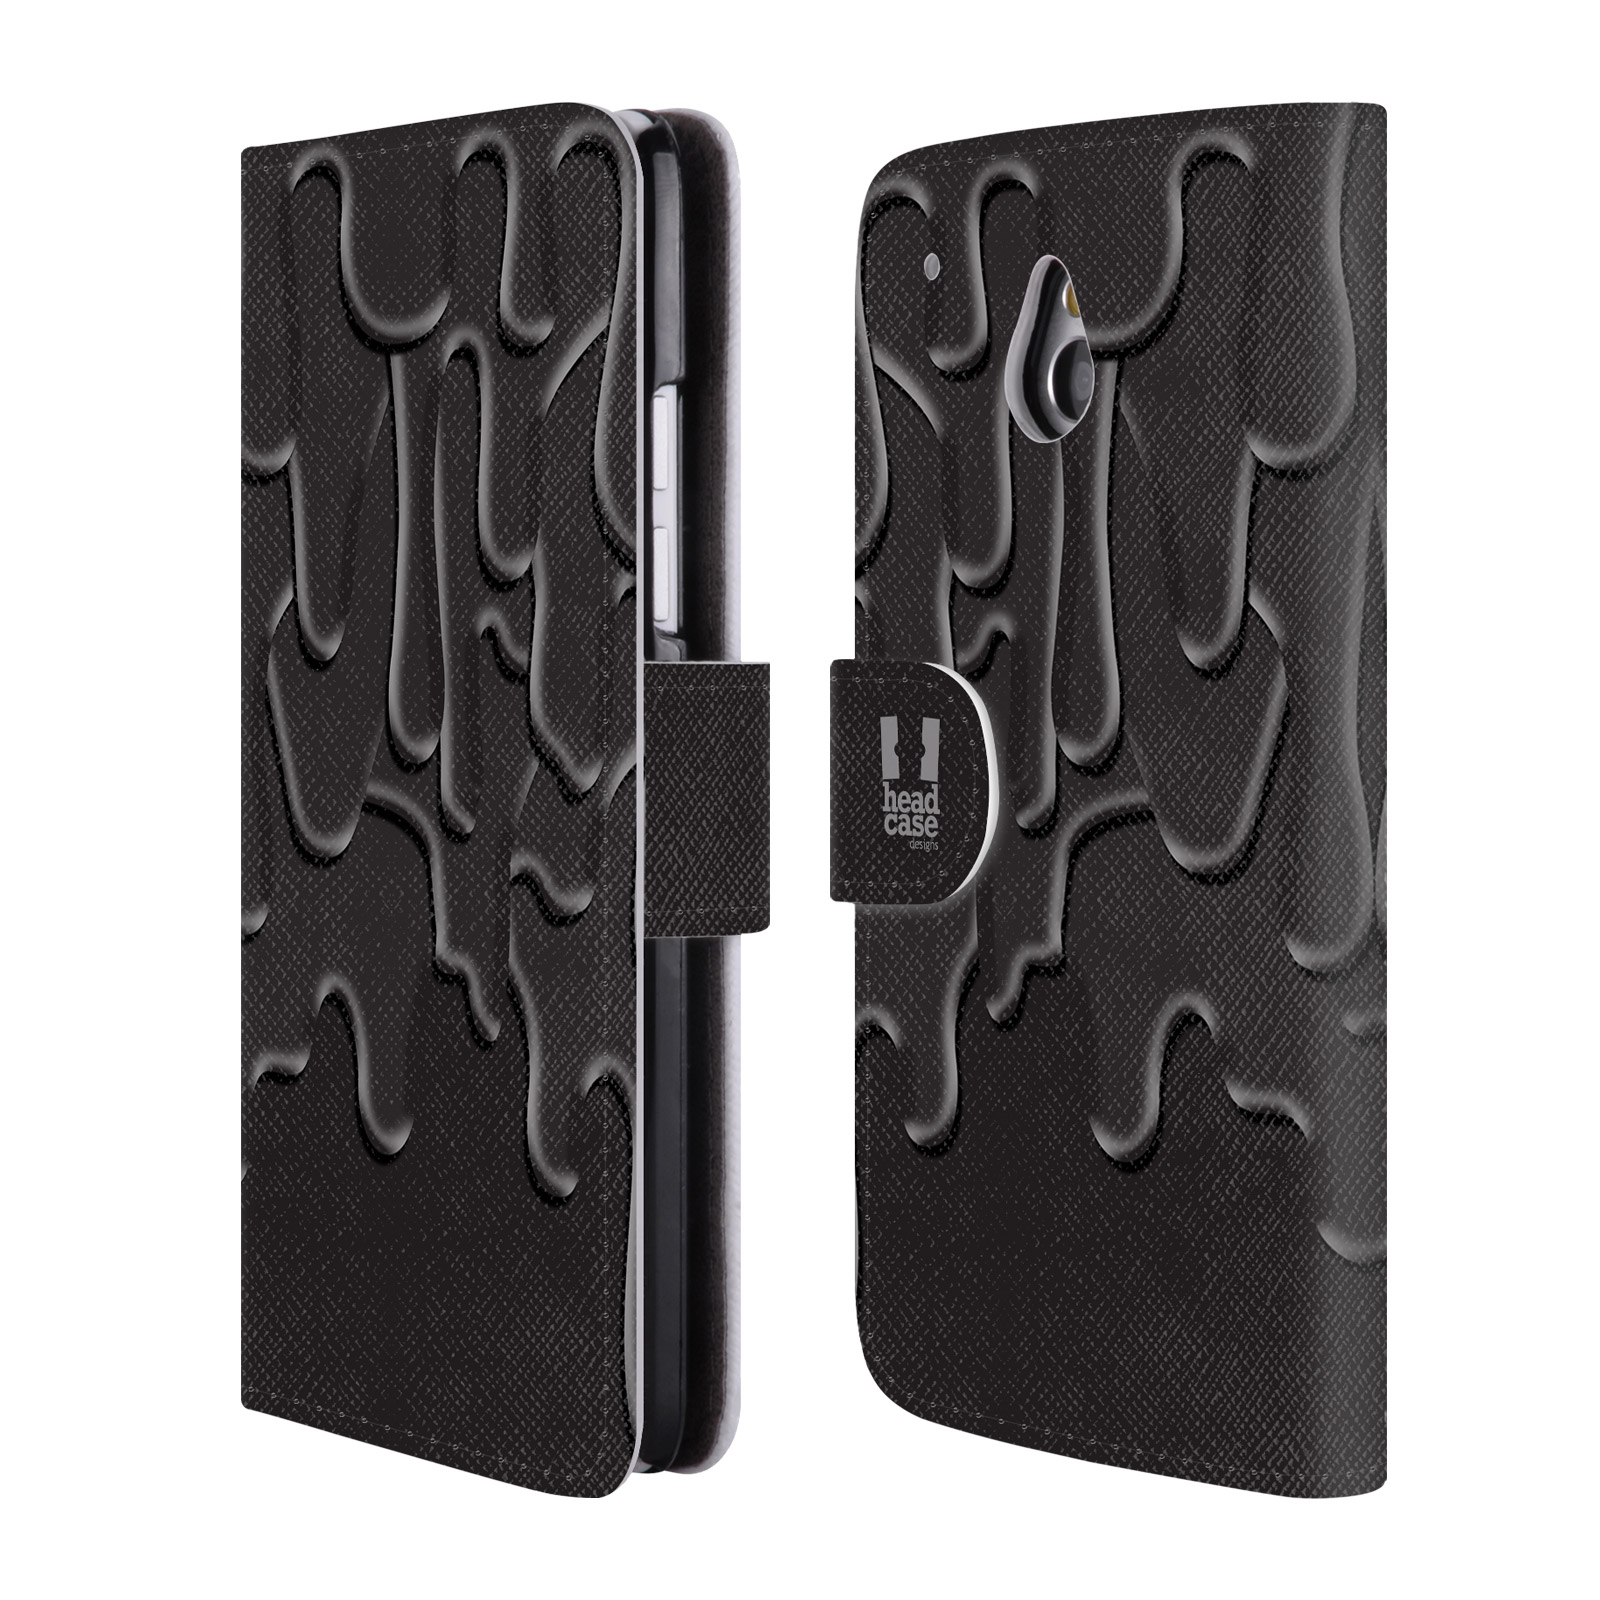 HEAD CASE Flipové pouzdro pro mobil HTC ONE MINI (M4) ZÁPLAVA BARVA černá